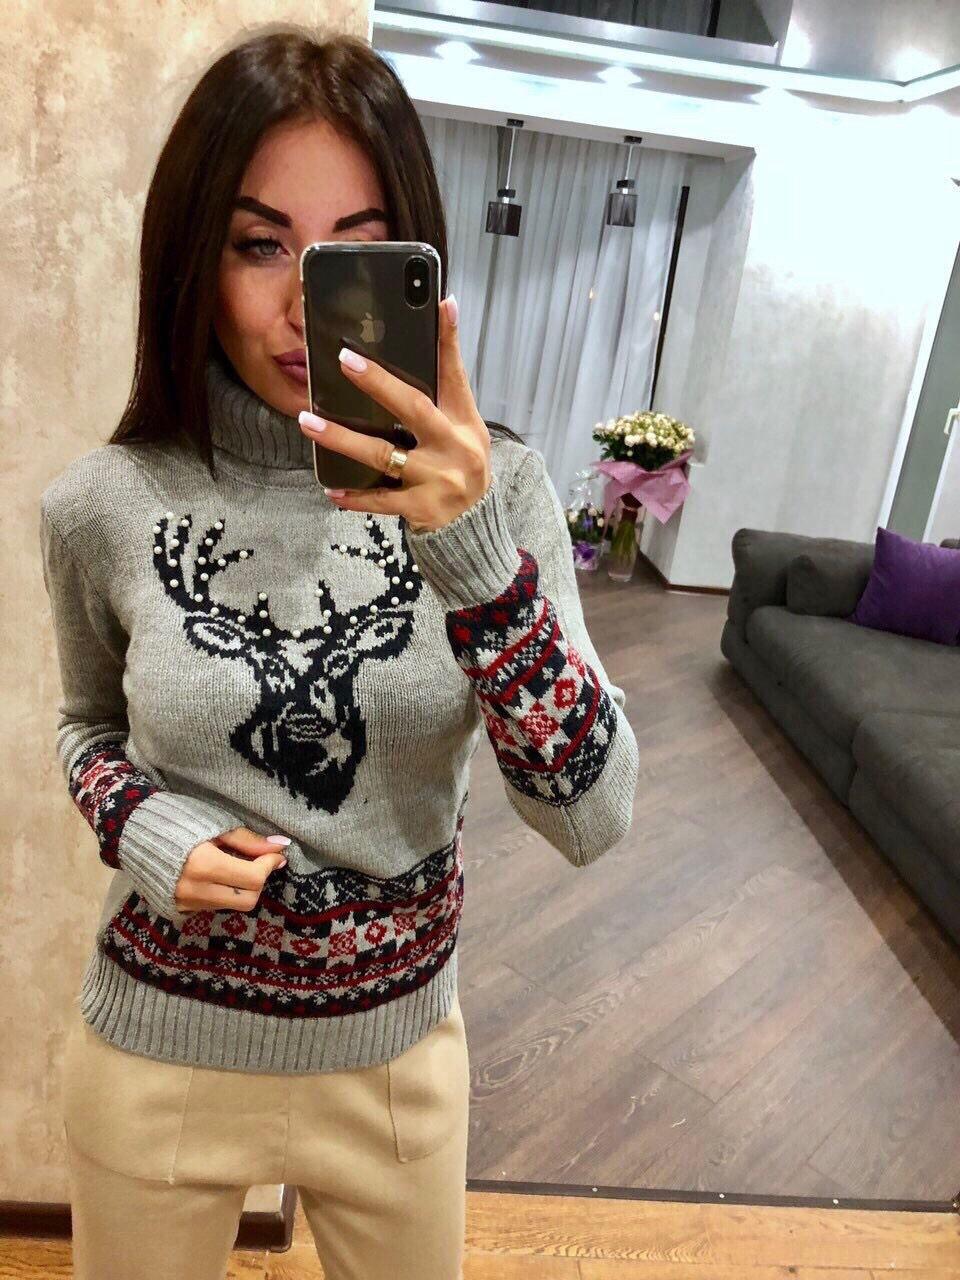 Модный турецкий свитер Новогодний орнамент серый  (42-46)